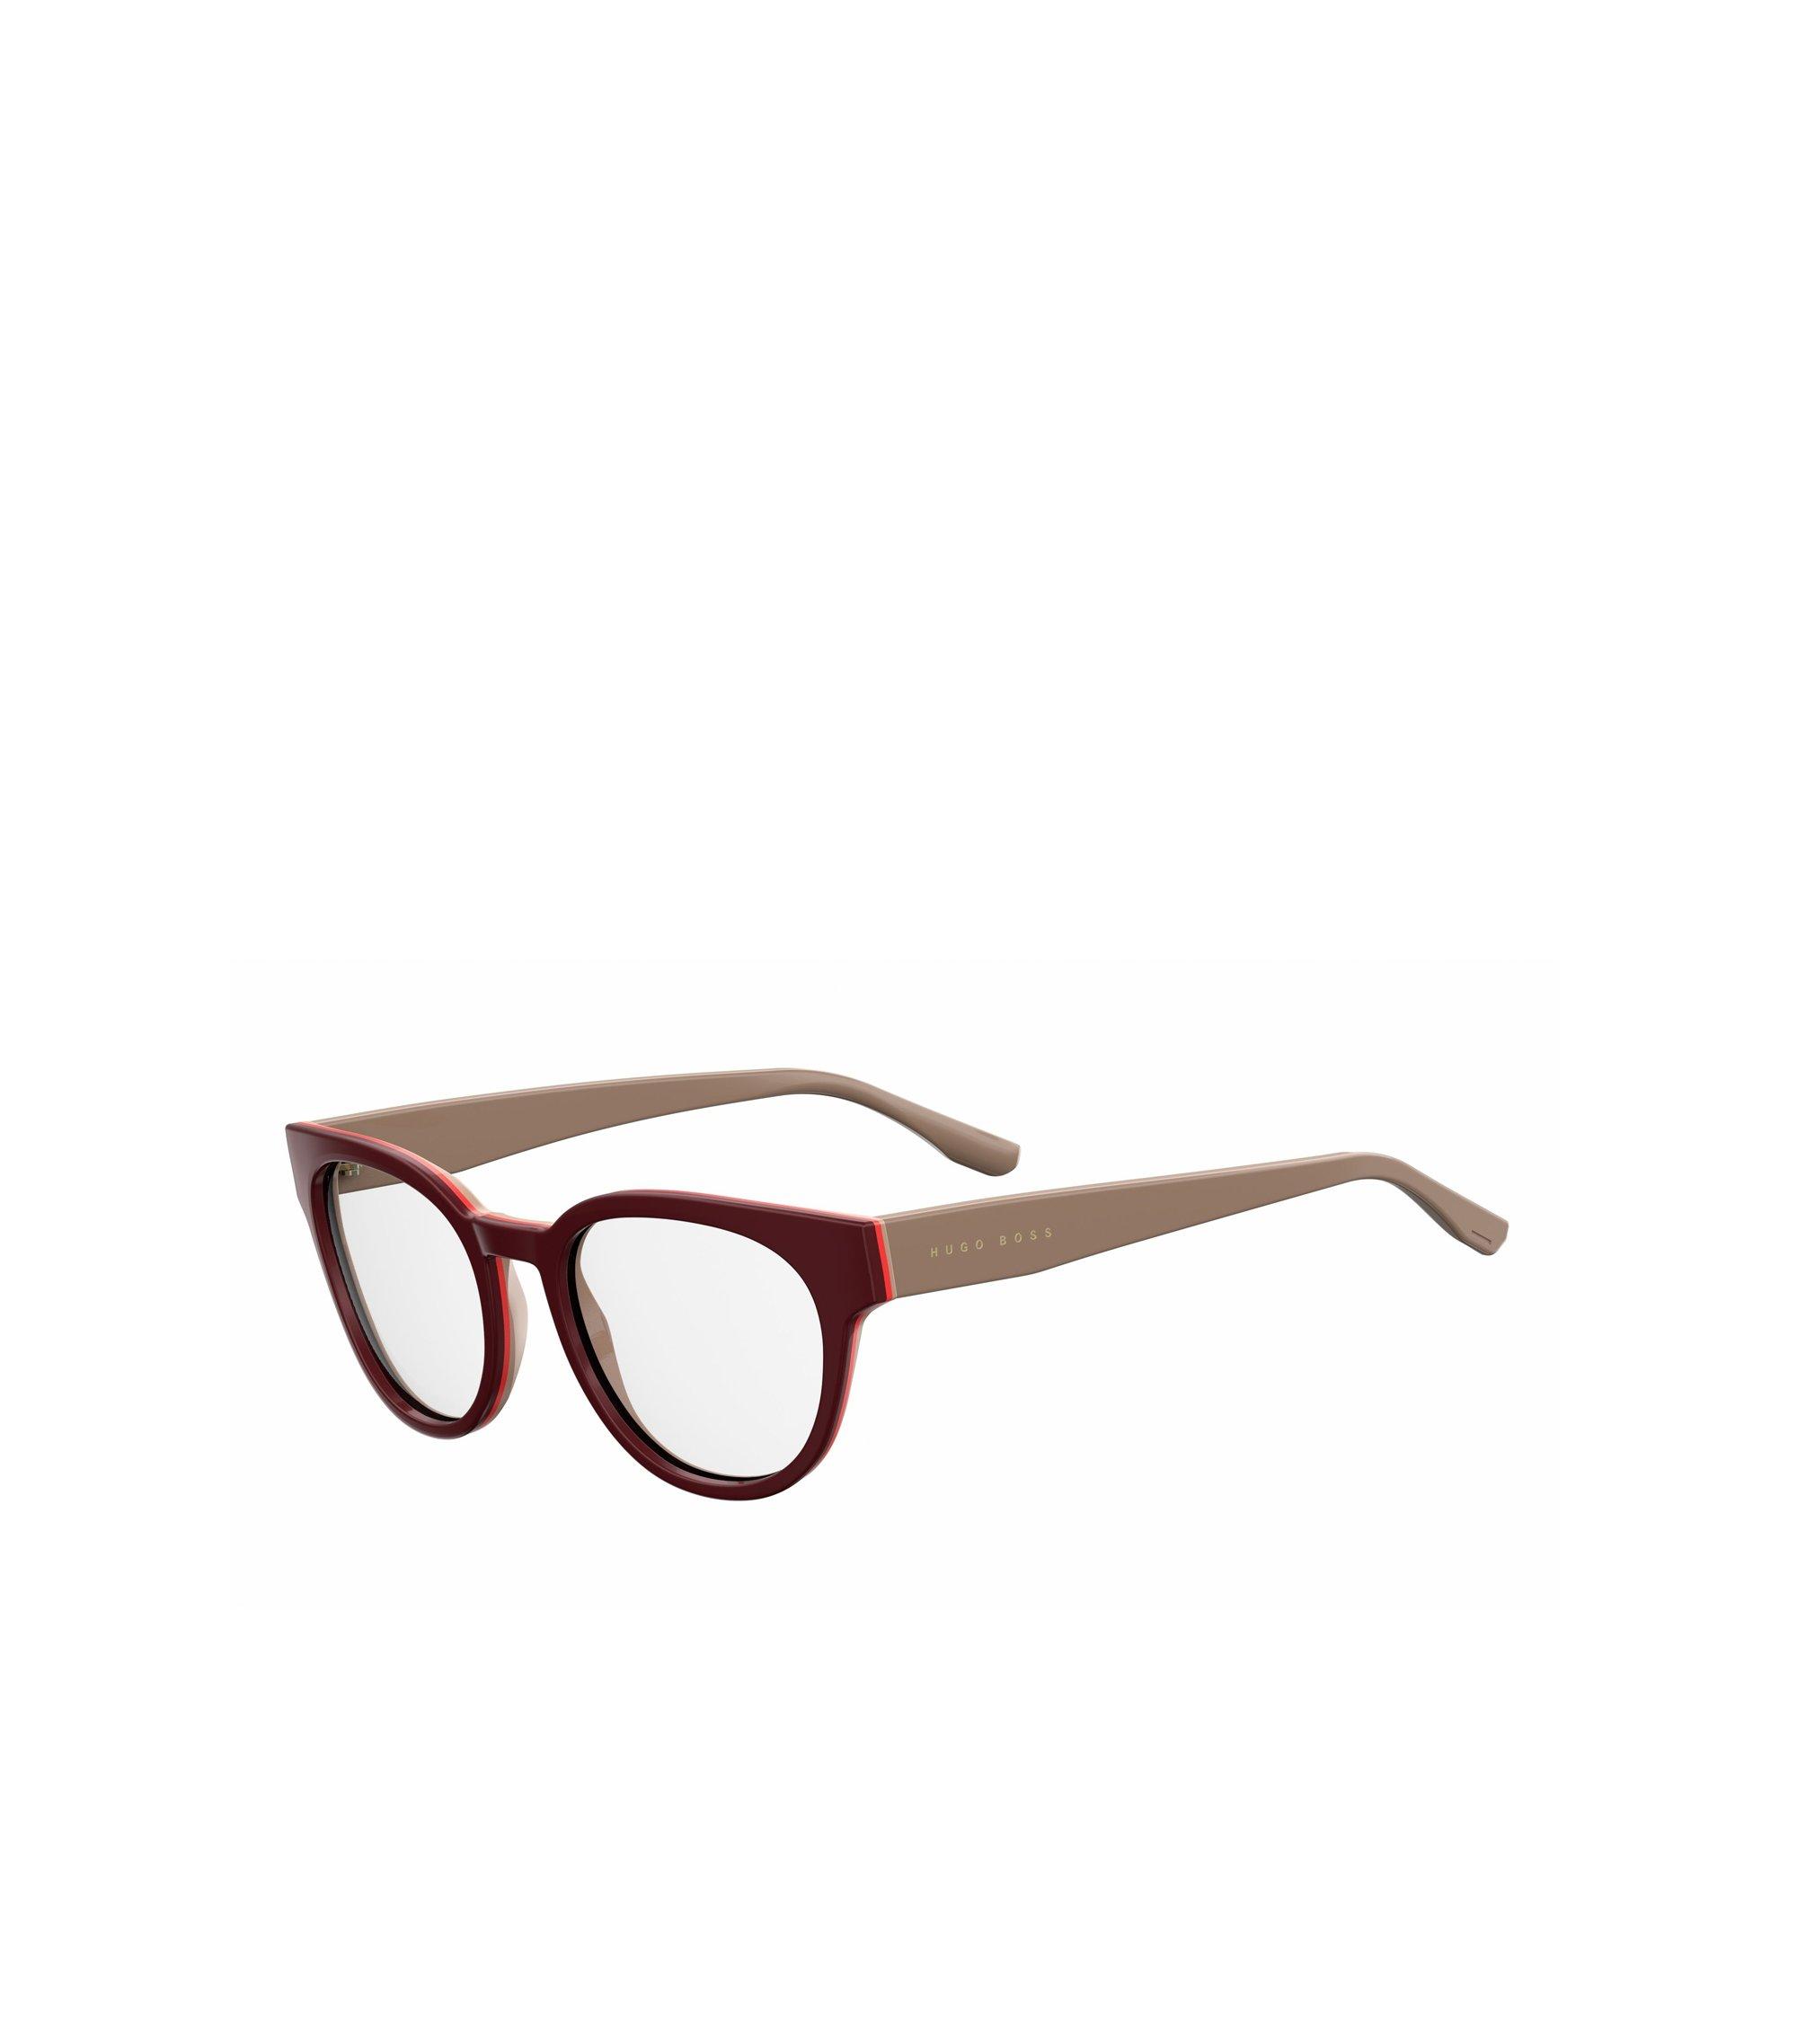 Burgundy Acetate Round Optical Frames | BOSS 0889 0U2, Assorted-Pre-Pack